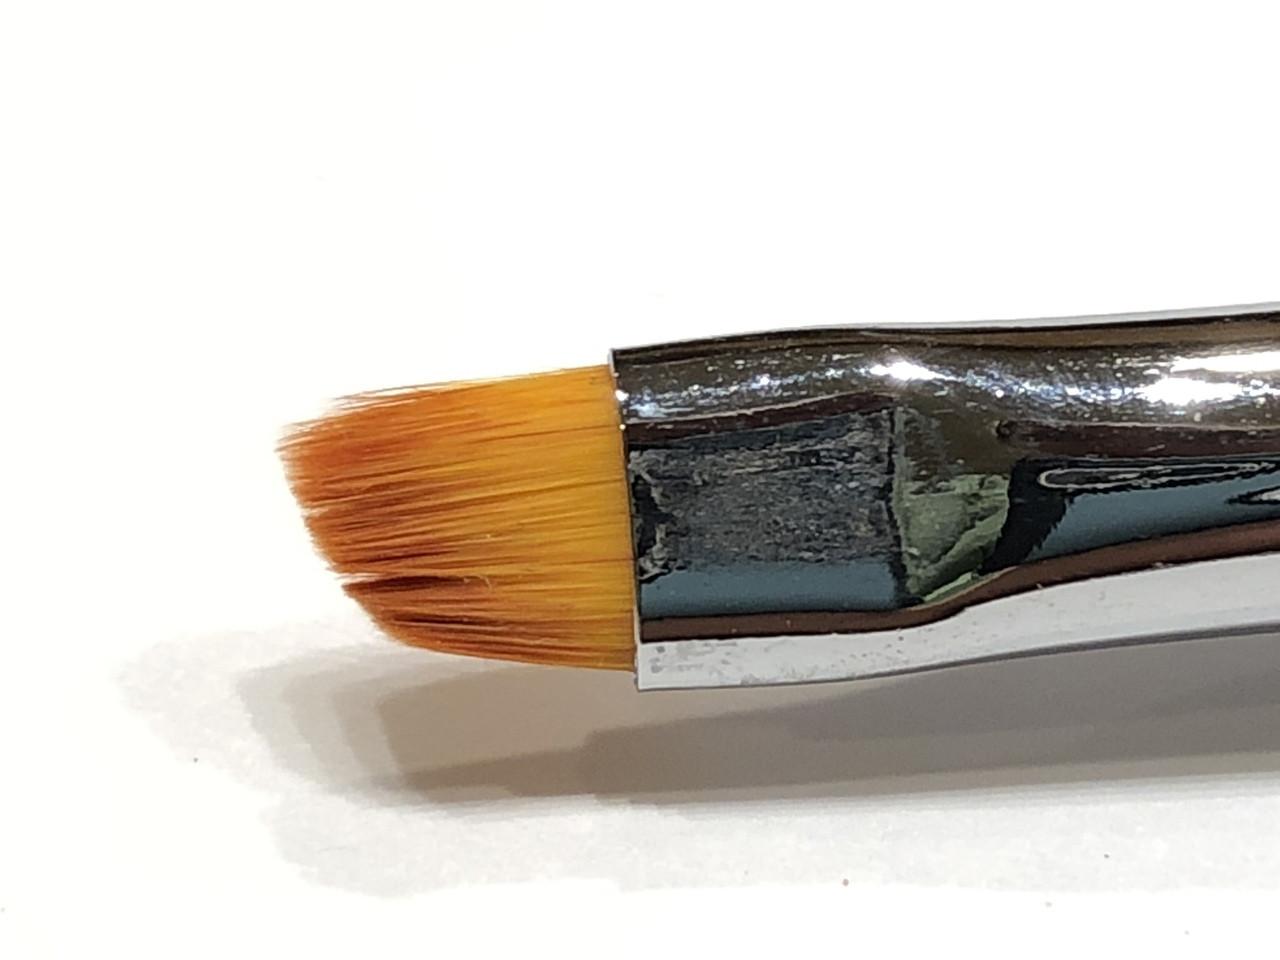 Lantern & Wren Angled Clean Up Brush, available only at www.lanternandwren.com.